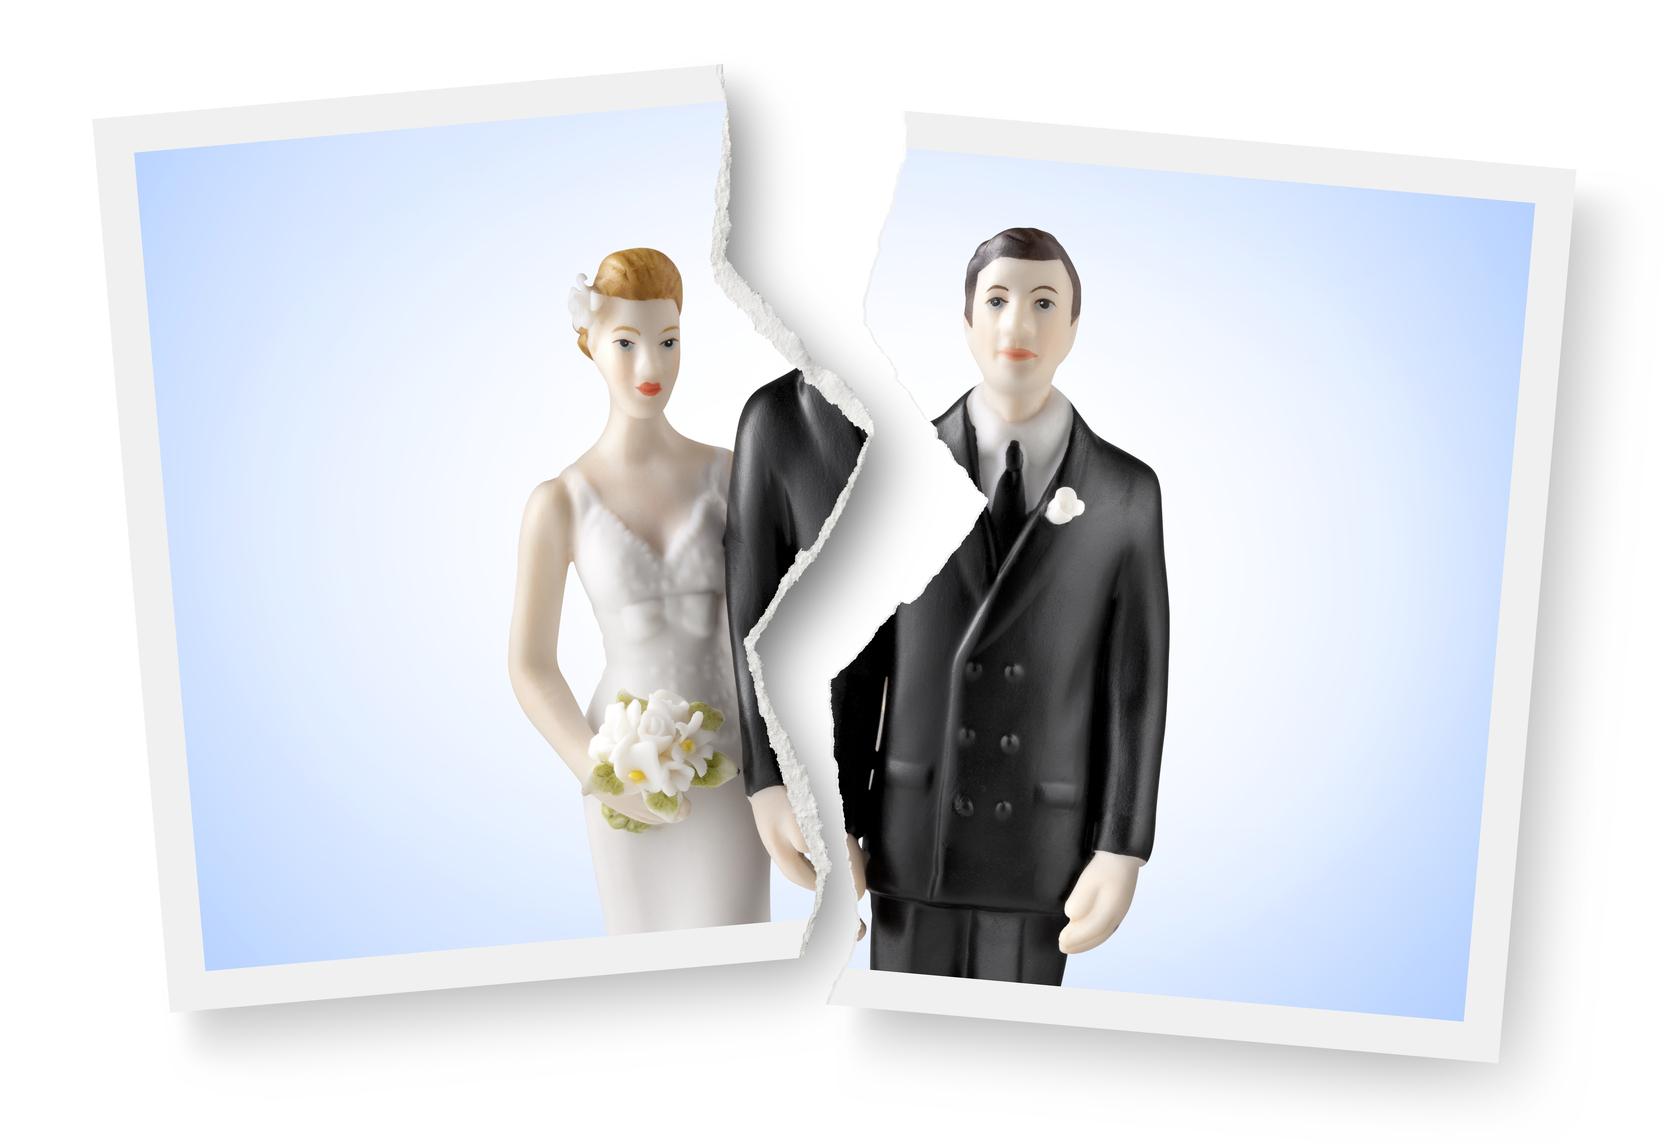 Divorce Rate Statistics by Occupation | LoveToKnow